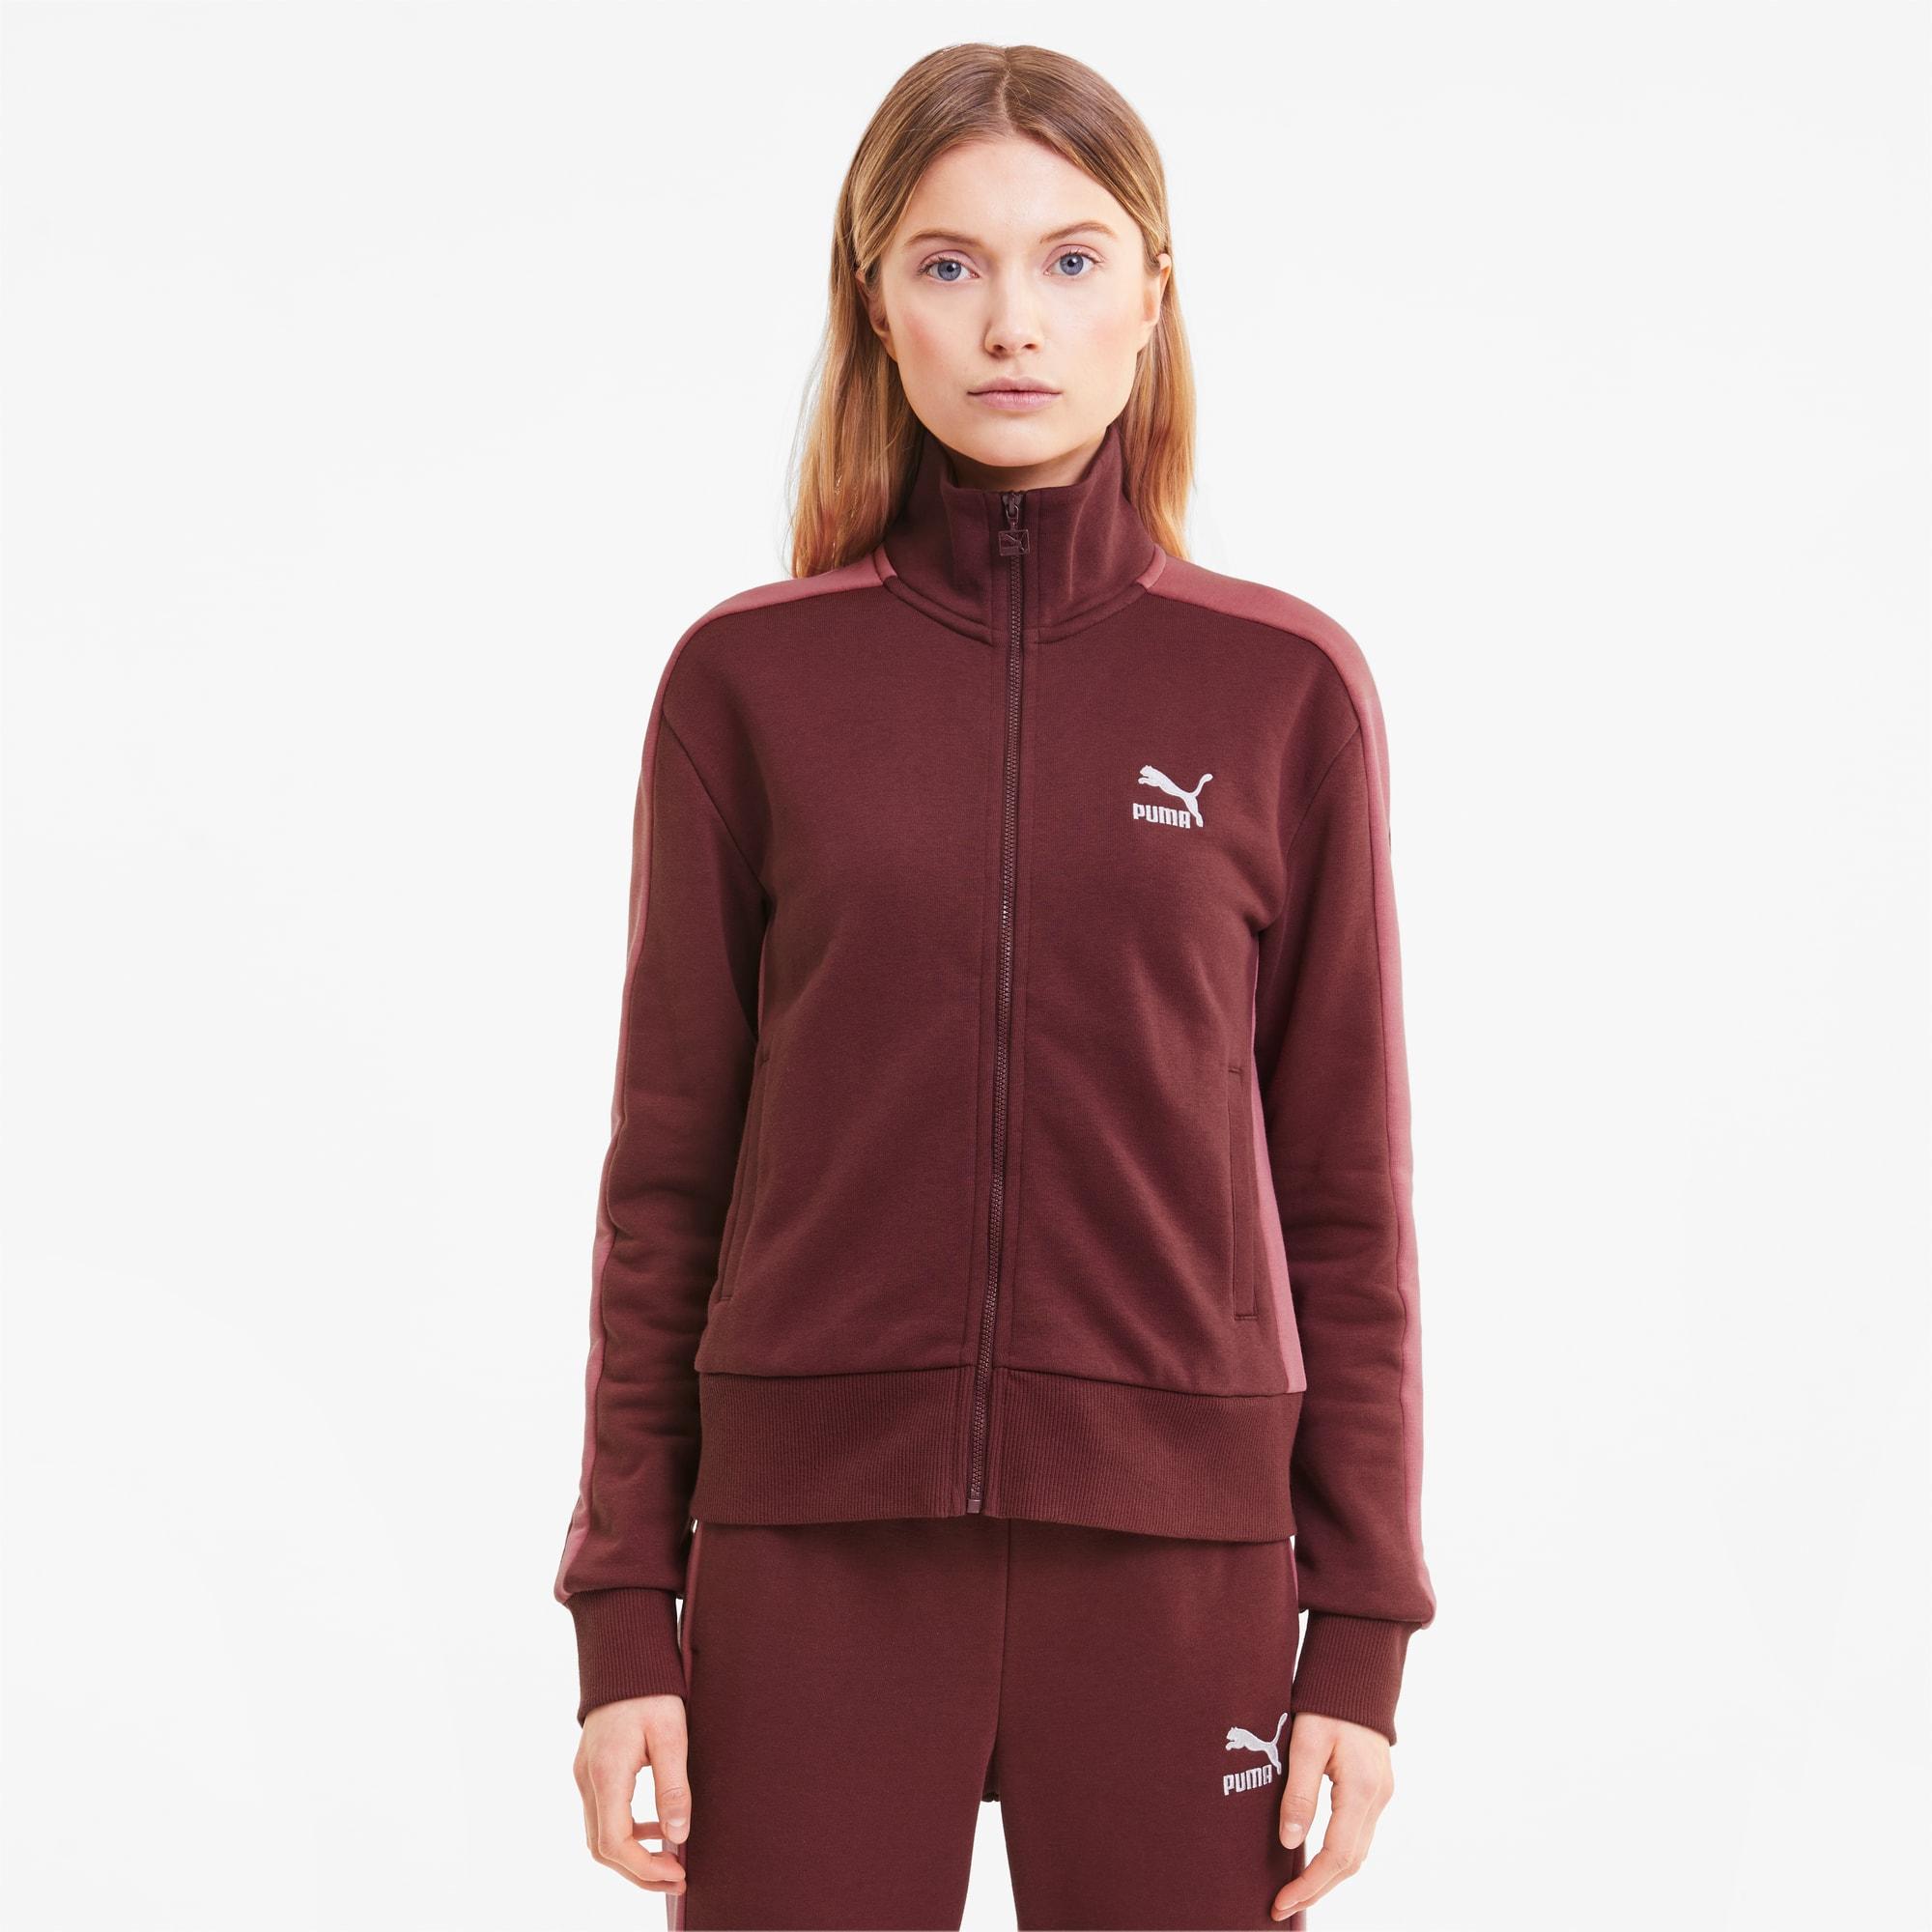 puma -  Iconic T7 Damen Trainingsjacke | Mit Aucun | Rot | Größe: XS